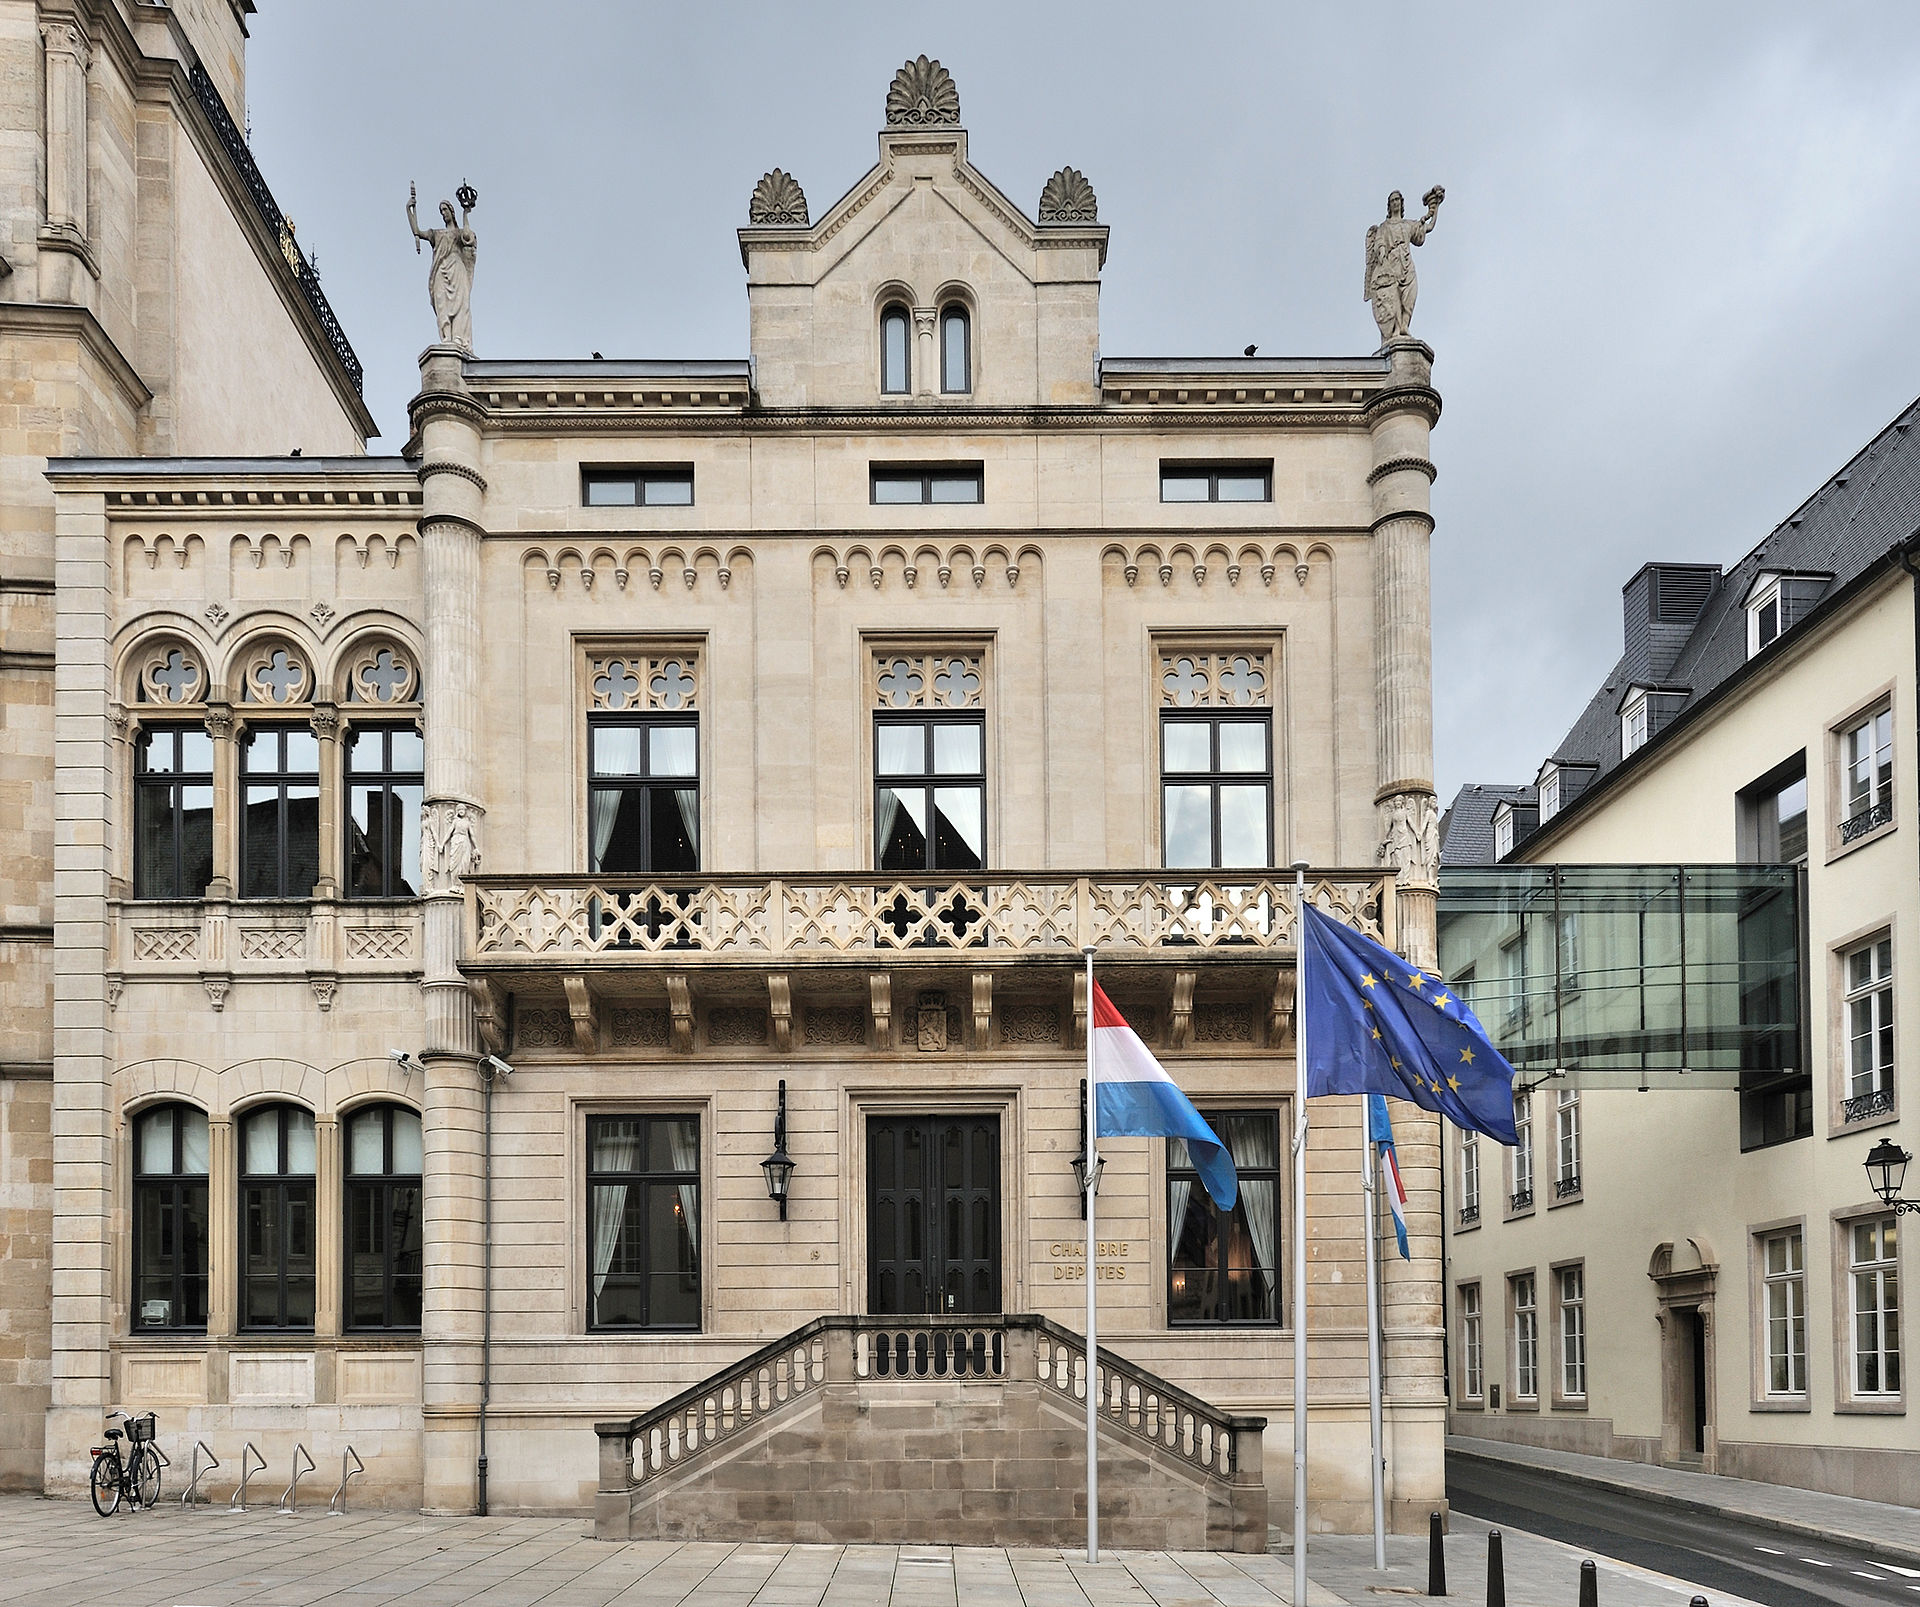 Chambre des Dputs Luxemburg  Wikipedia